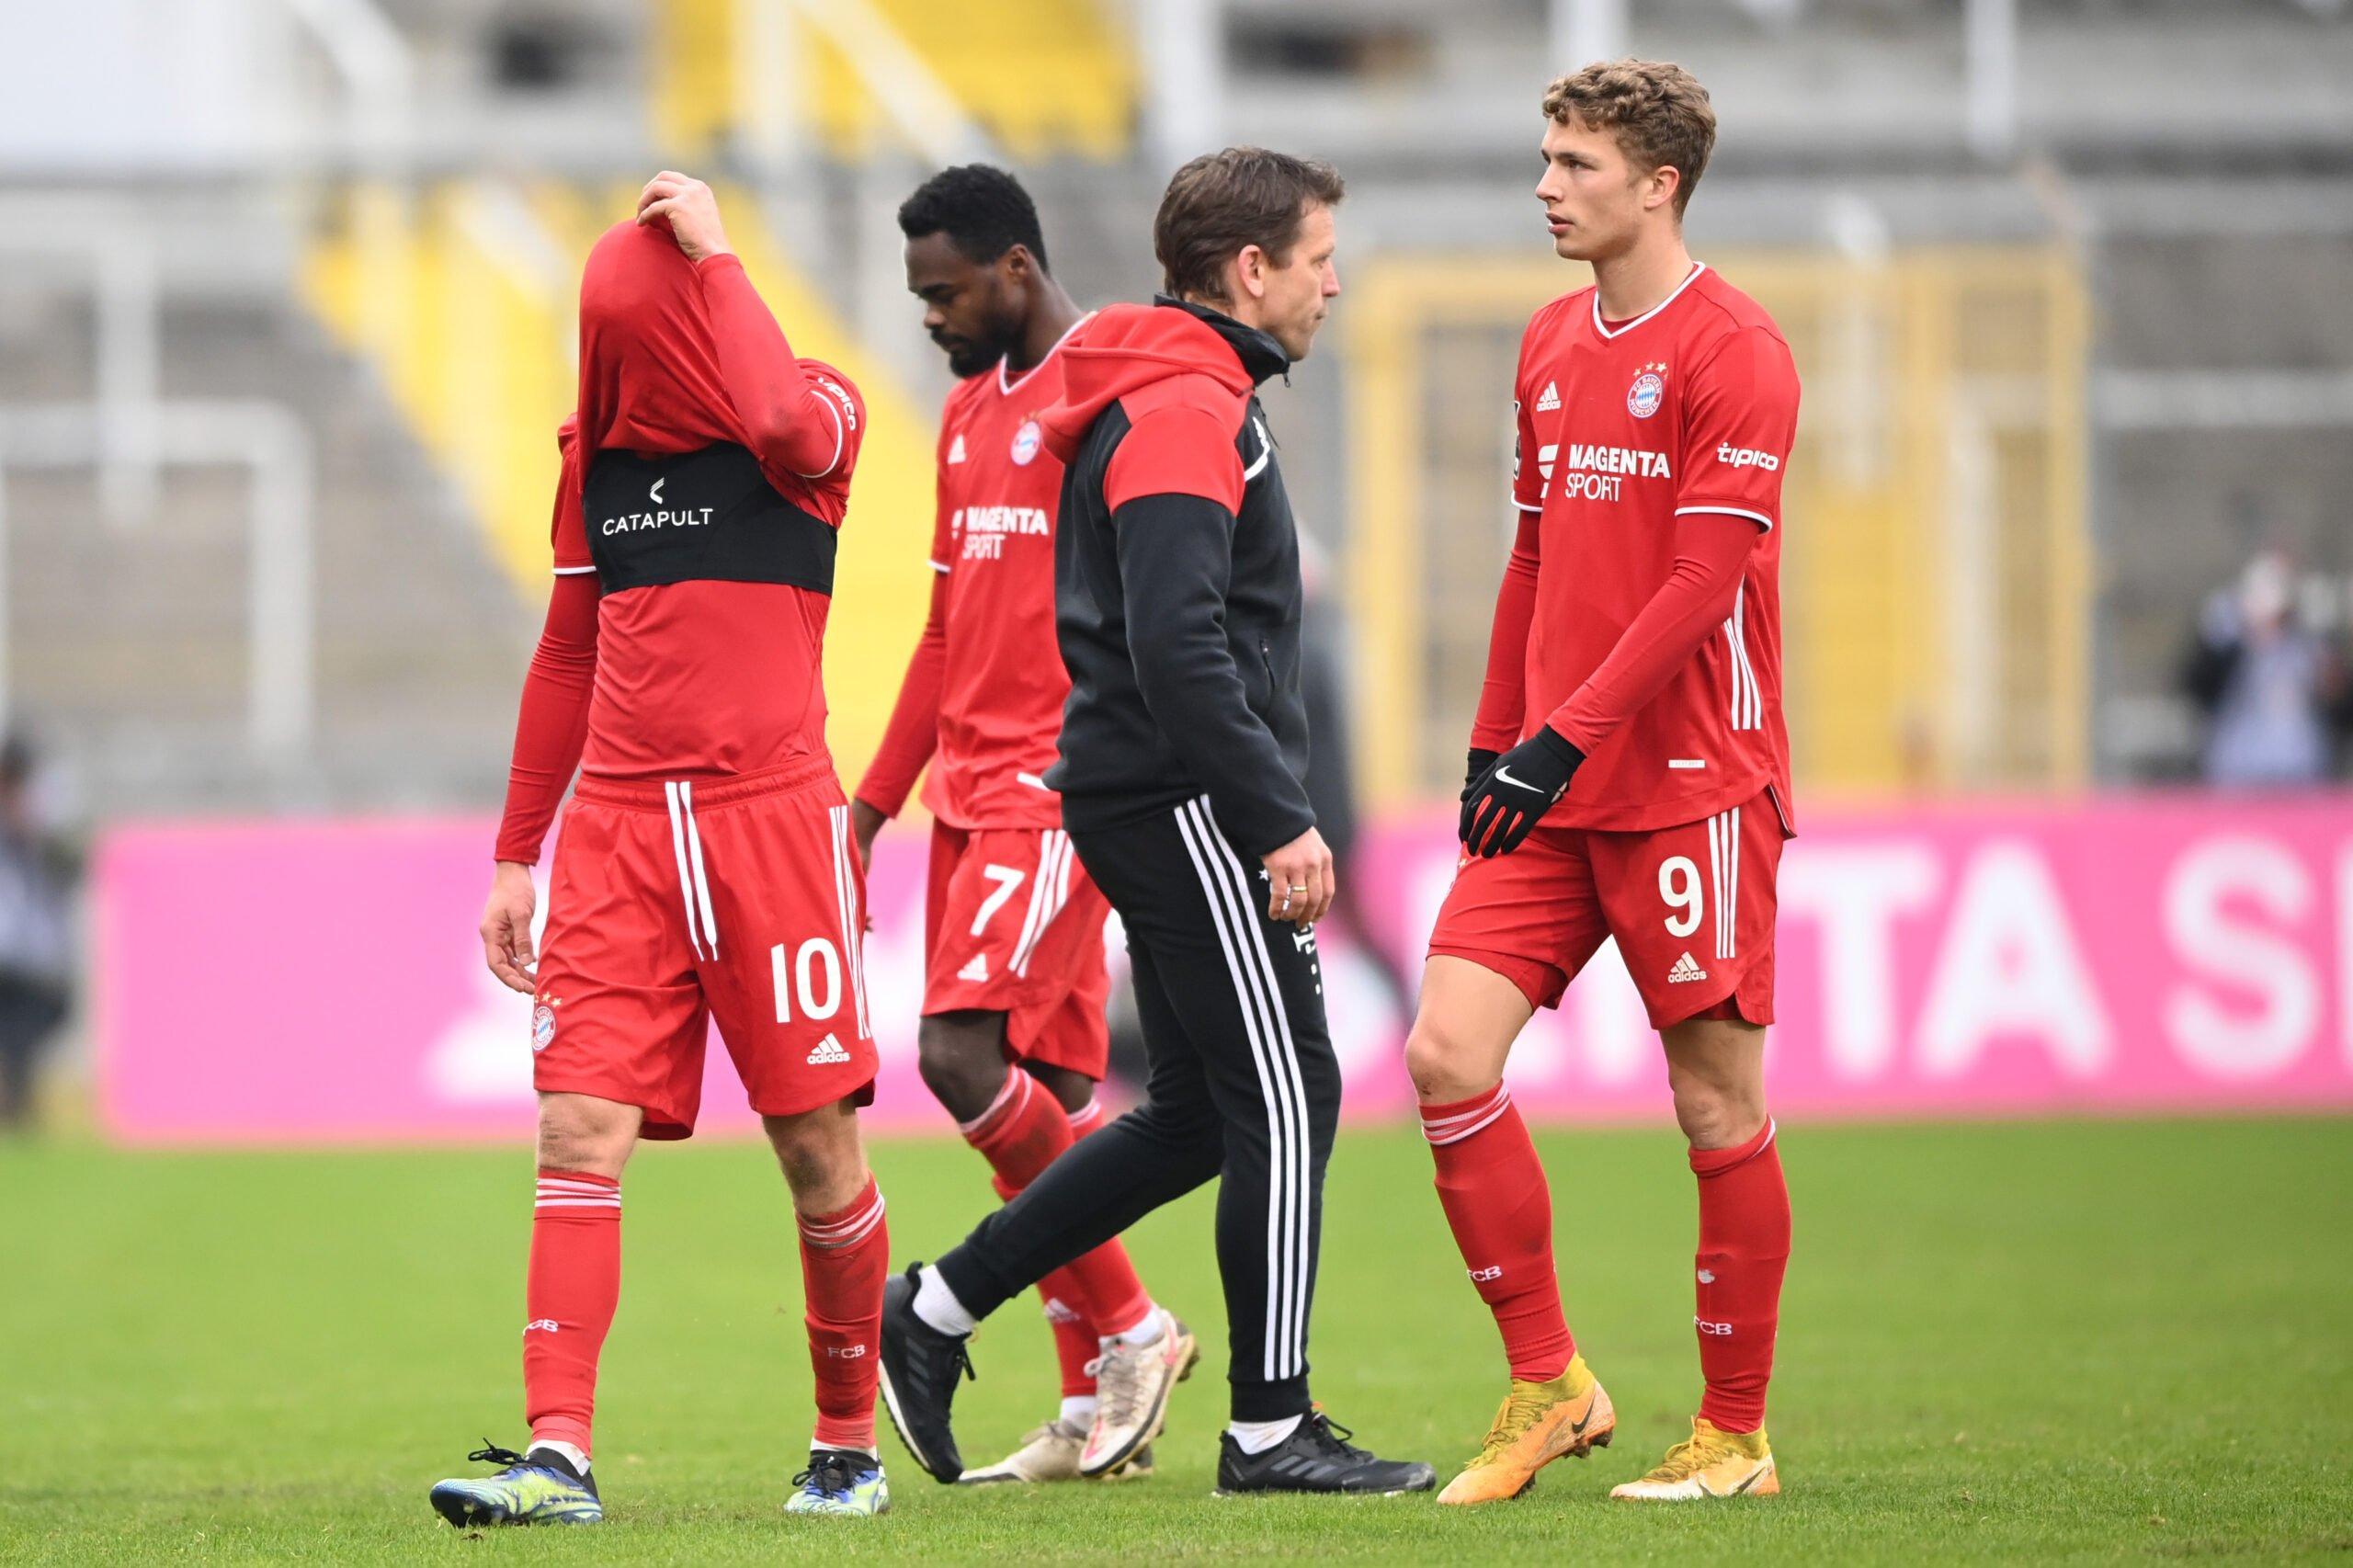 Bayern München II v KFC Uerdingen 05 - 3. Liga